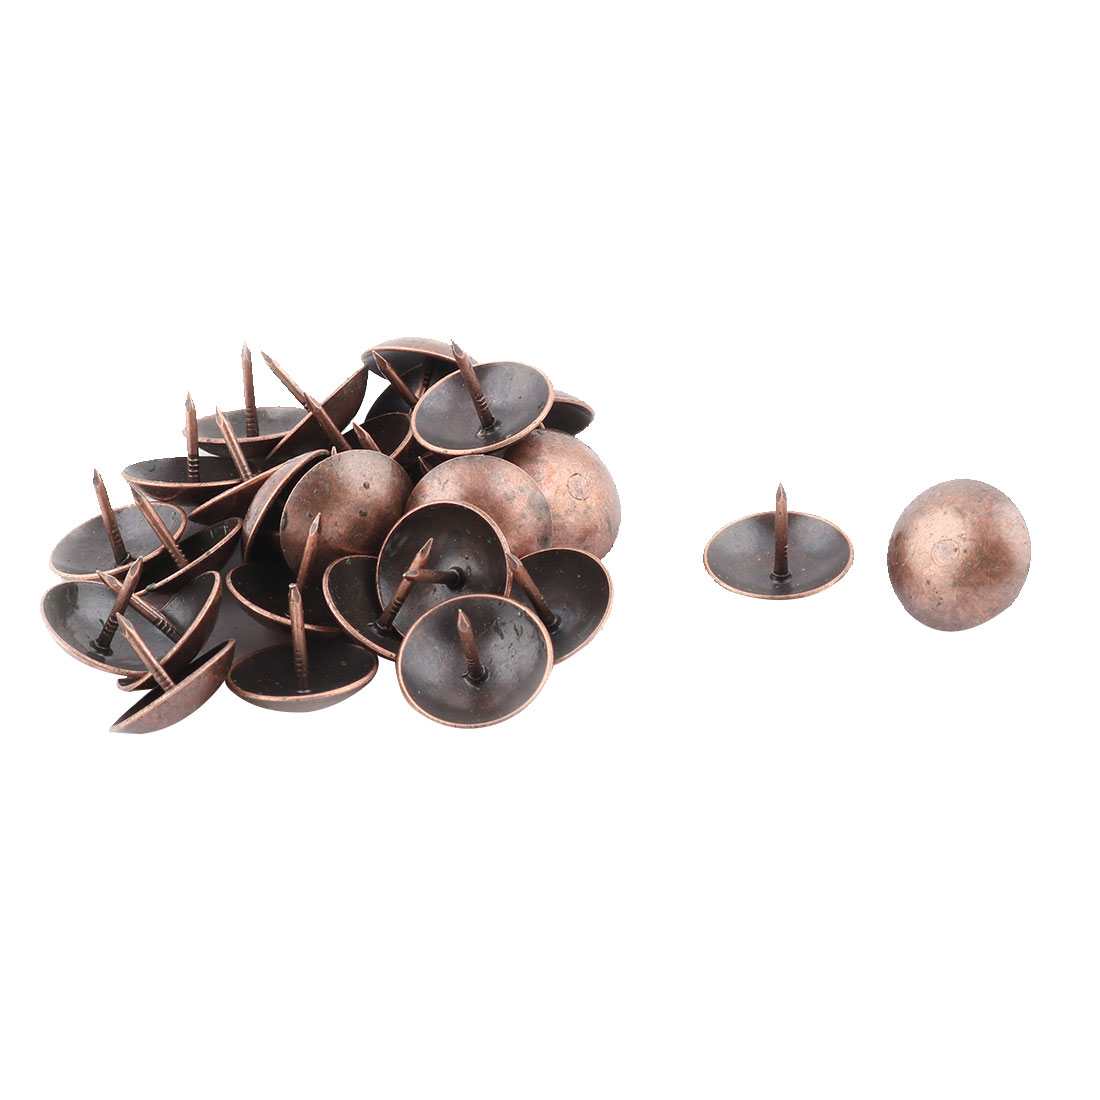 Home Furniture Metal Round Top Upholstery Thumb Tack Nail Pushpin Copper Tone 19 x 15mm 30pcs